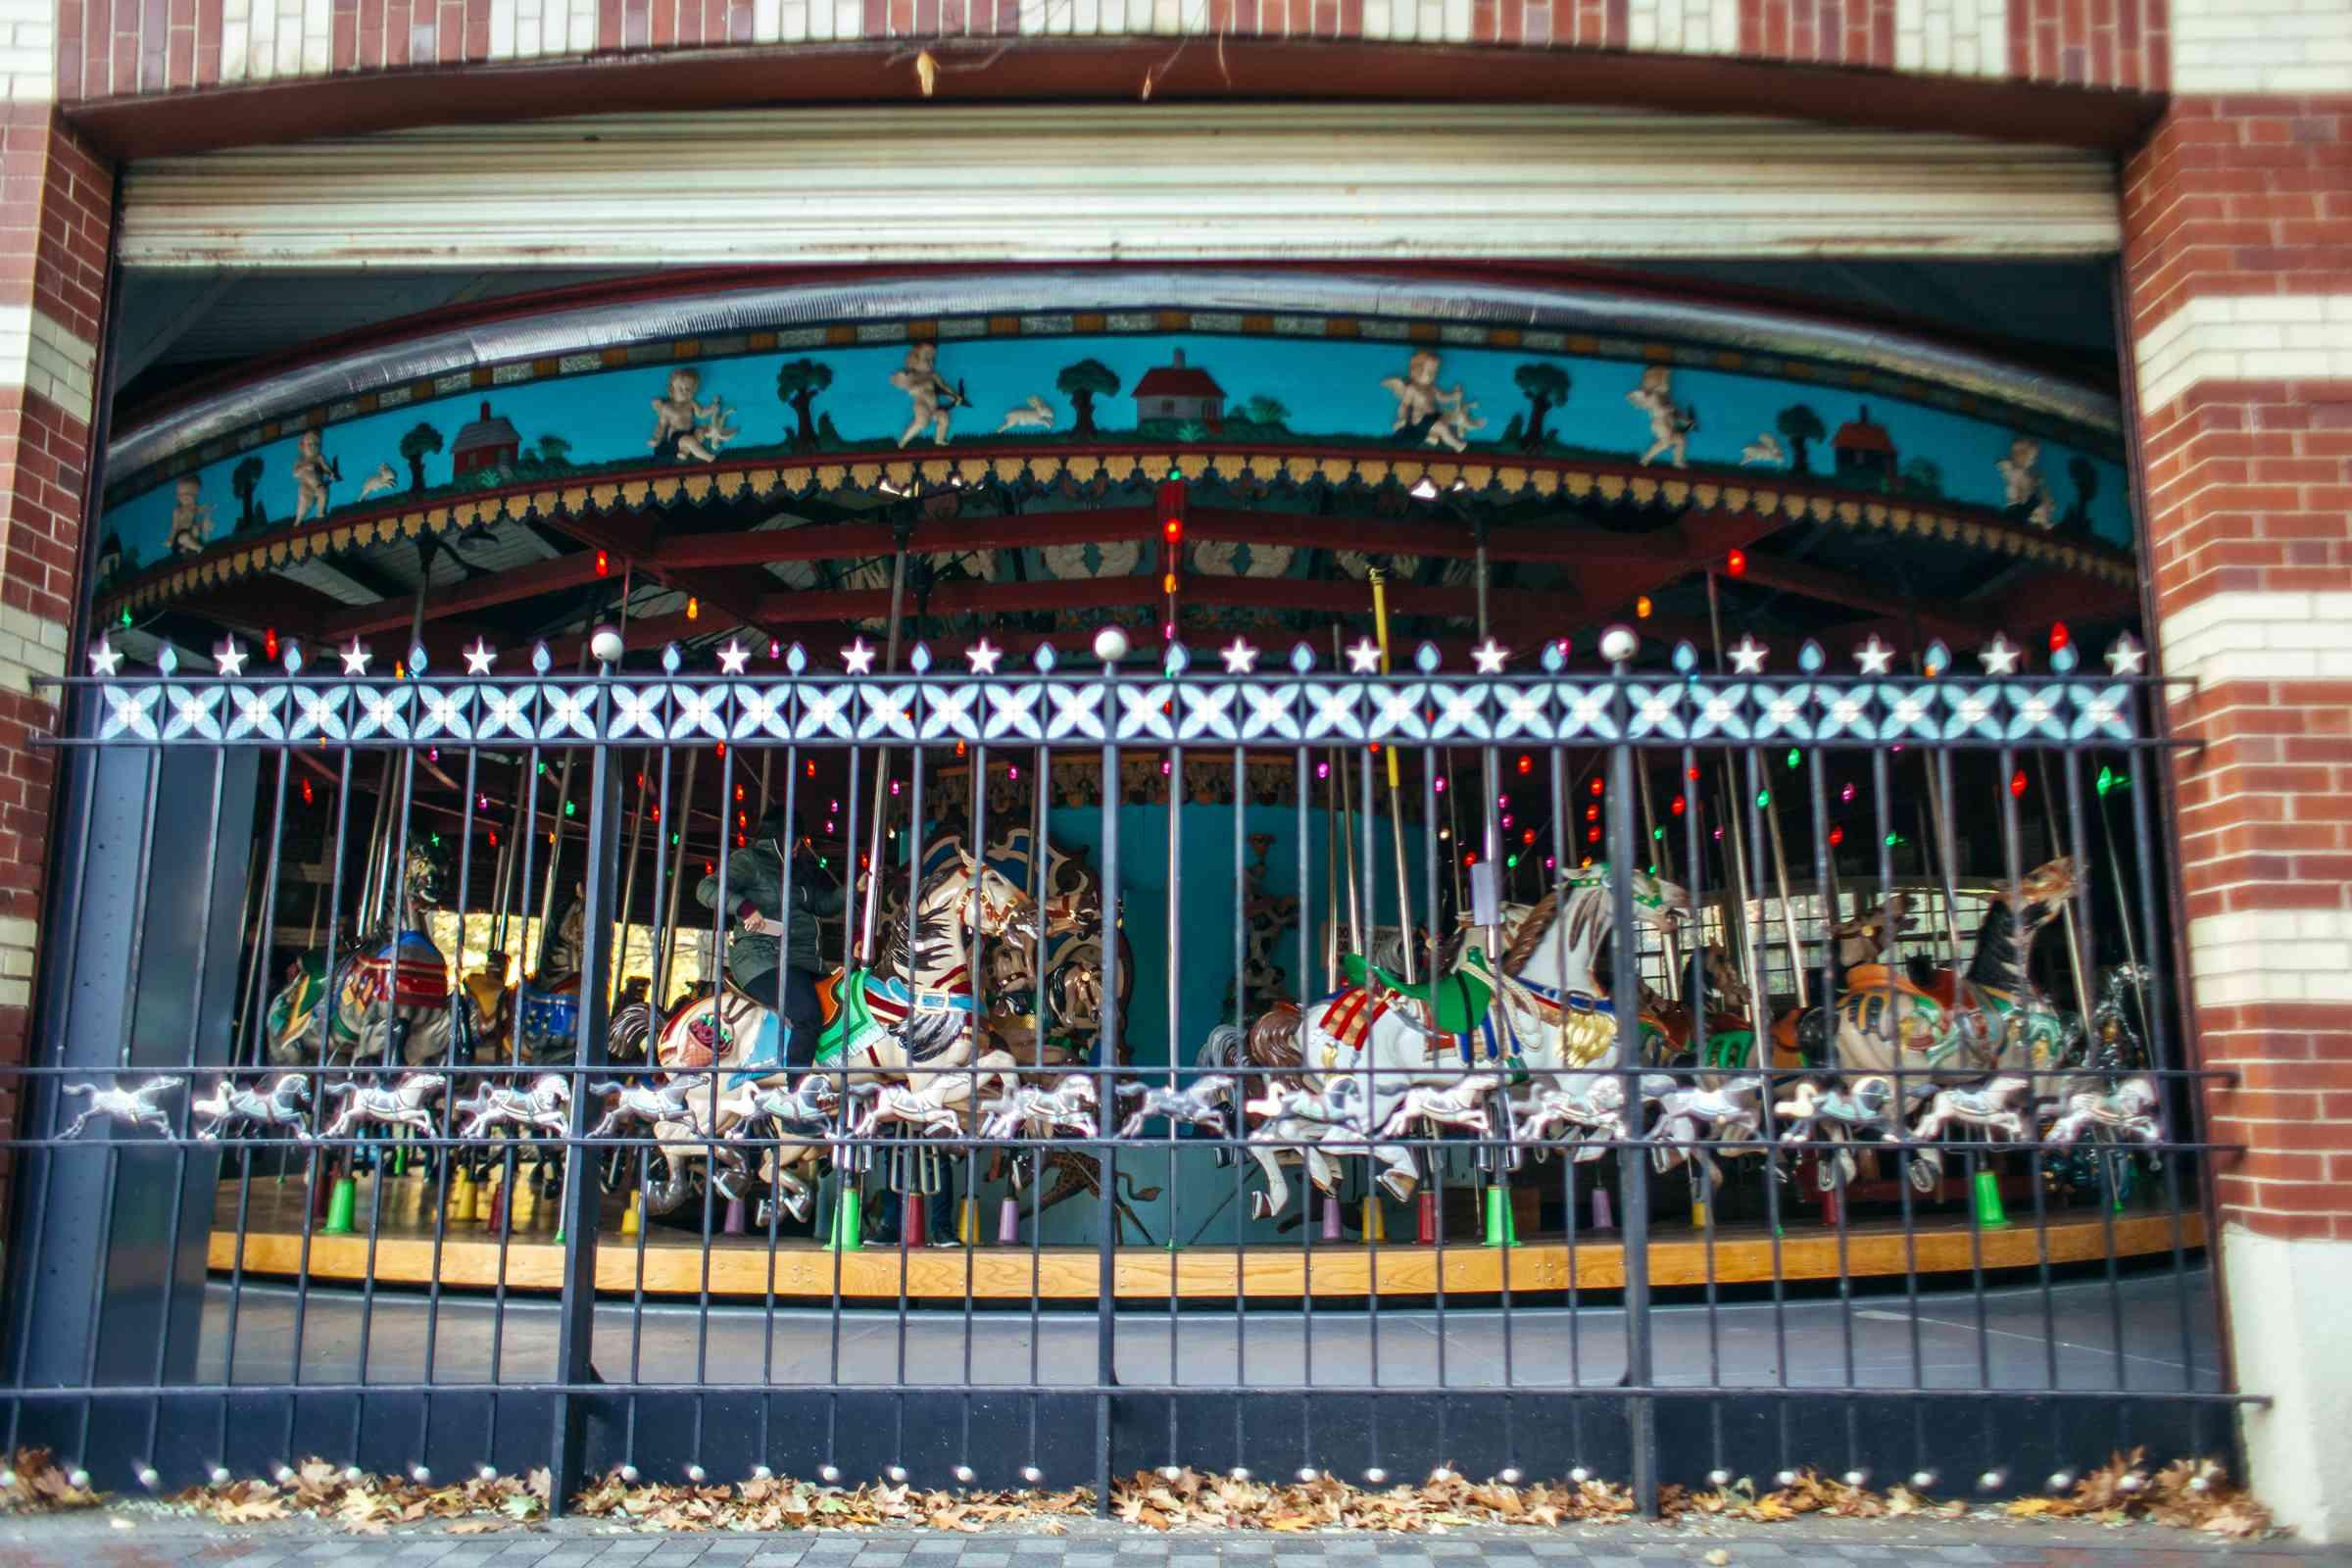 Central Park Carousel, New York City